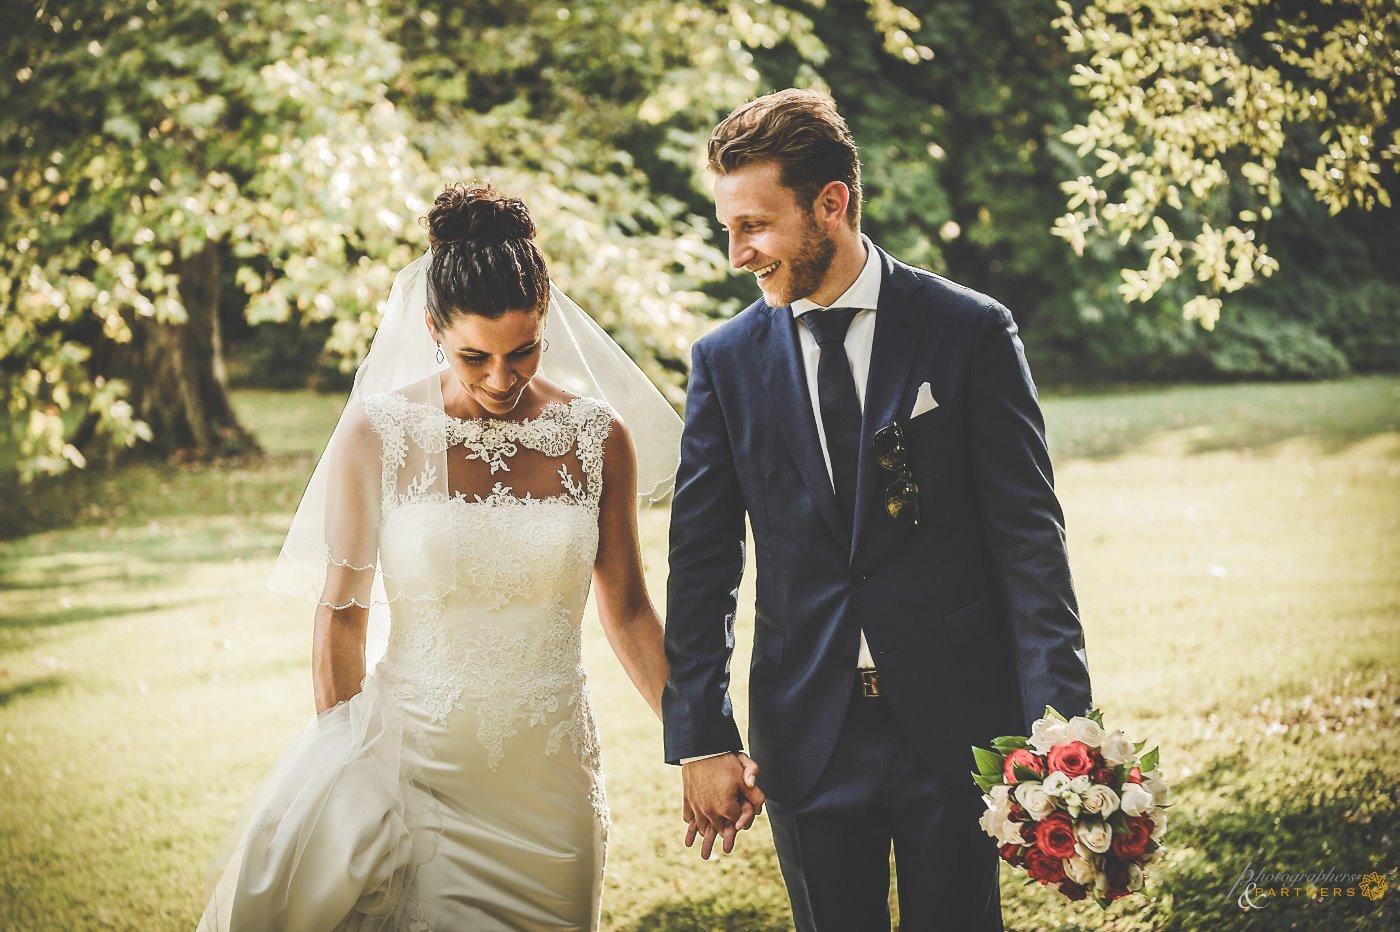 photography_weddings_villa_grabau_12.jpg